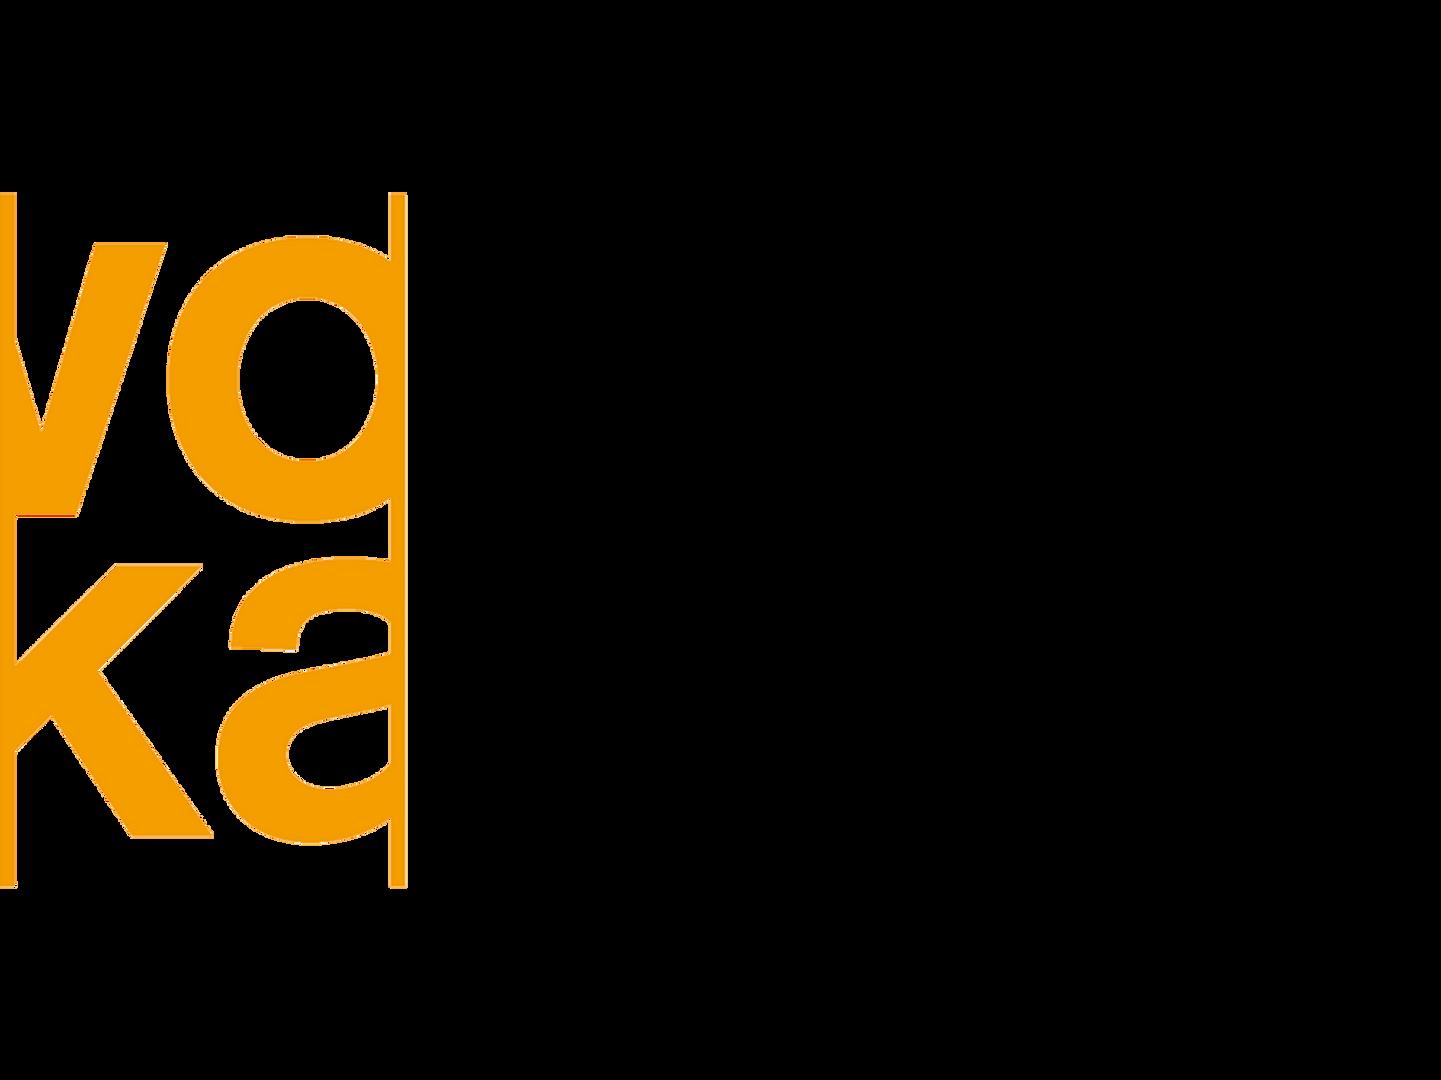 voka logo.png